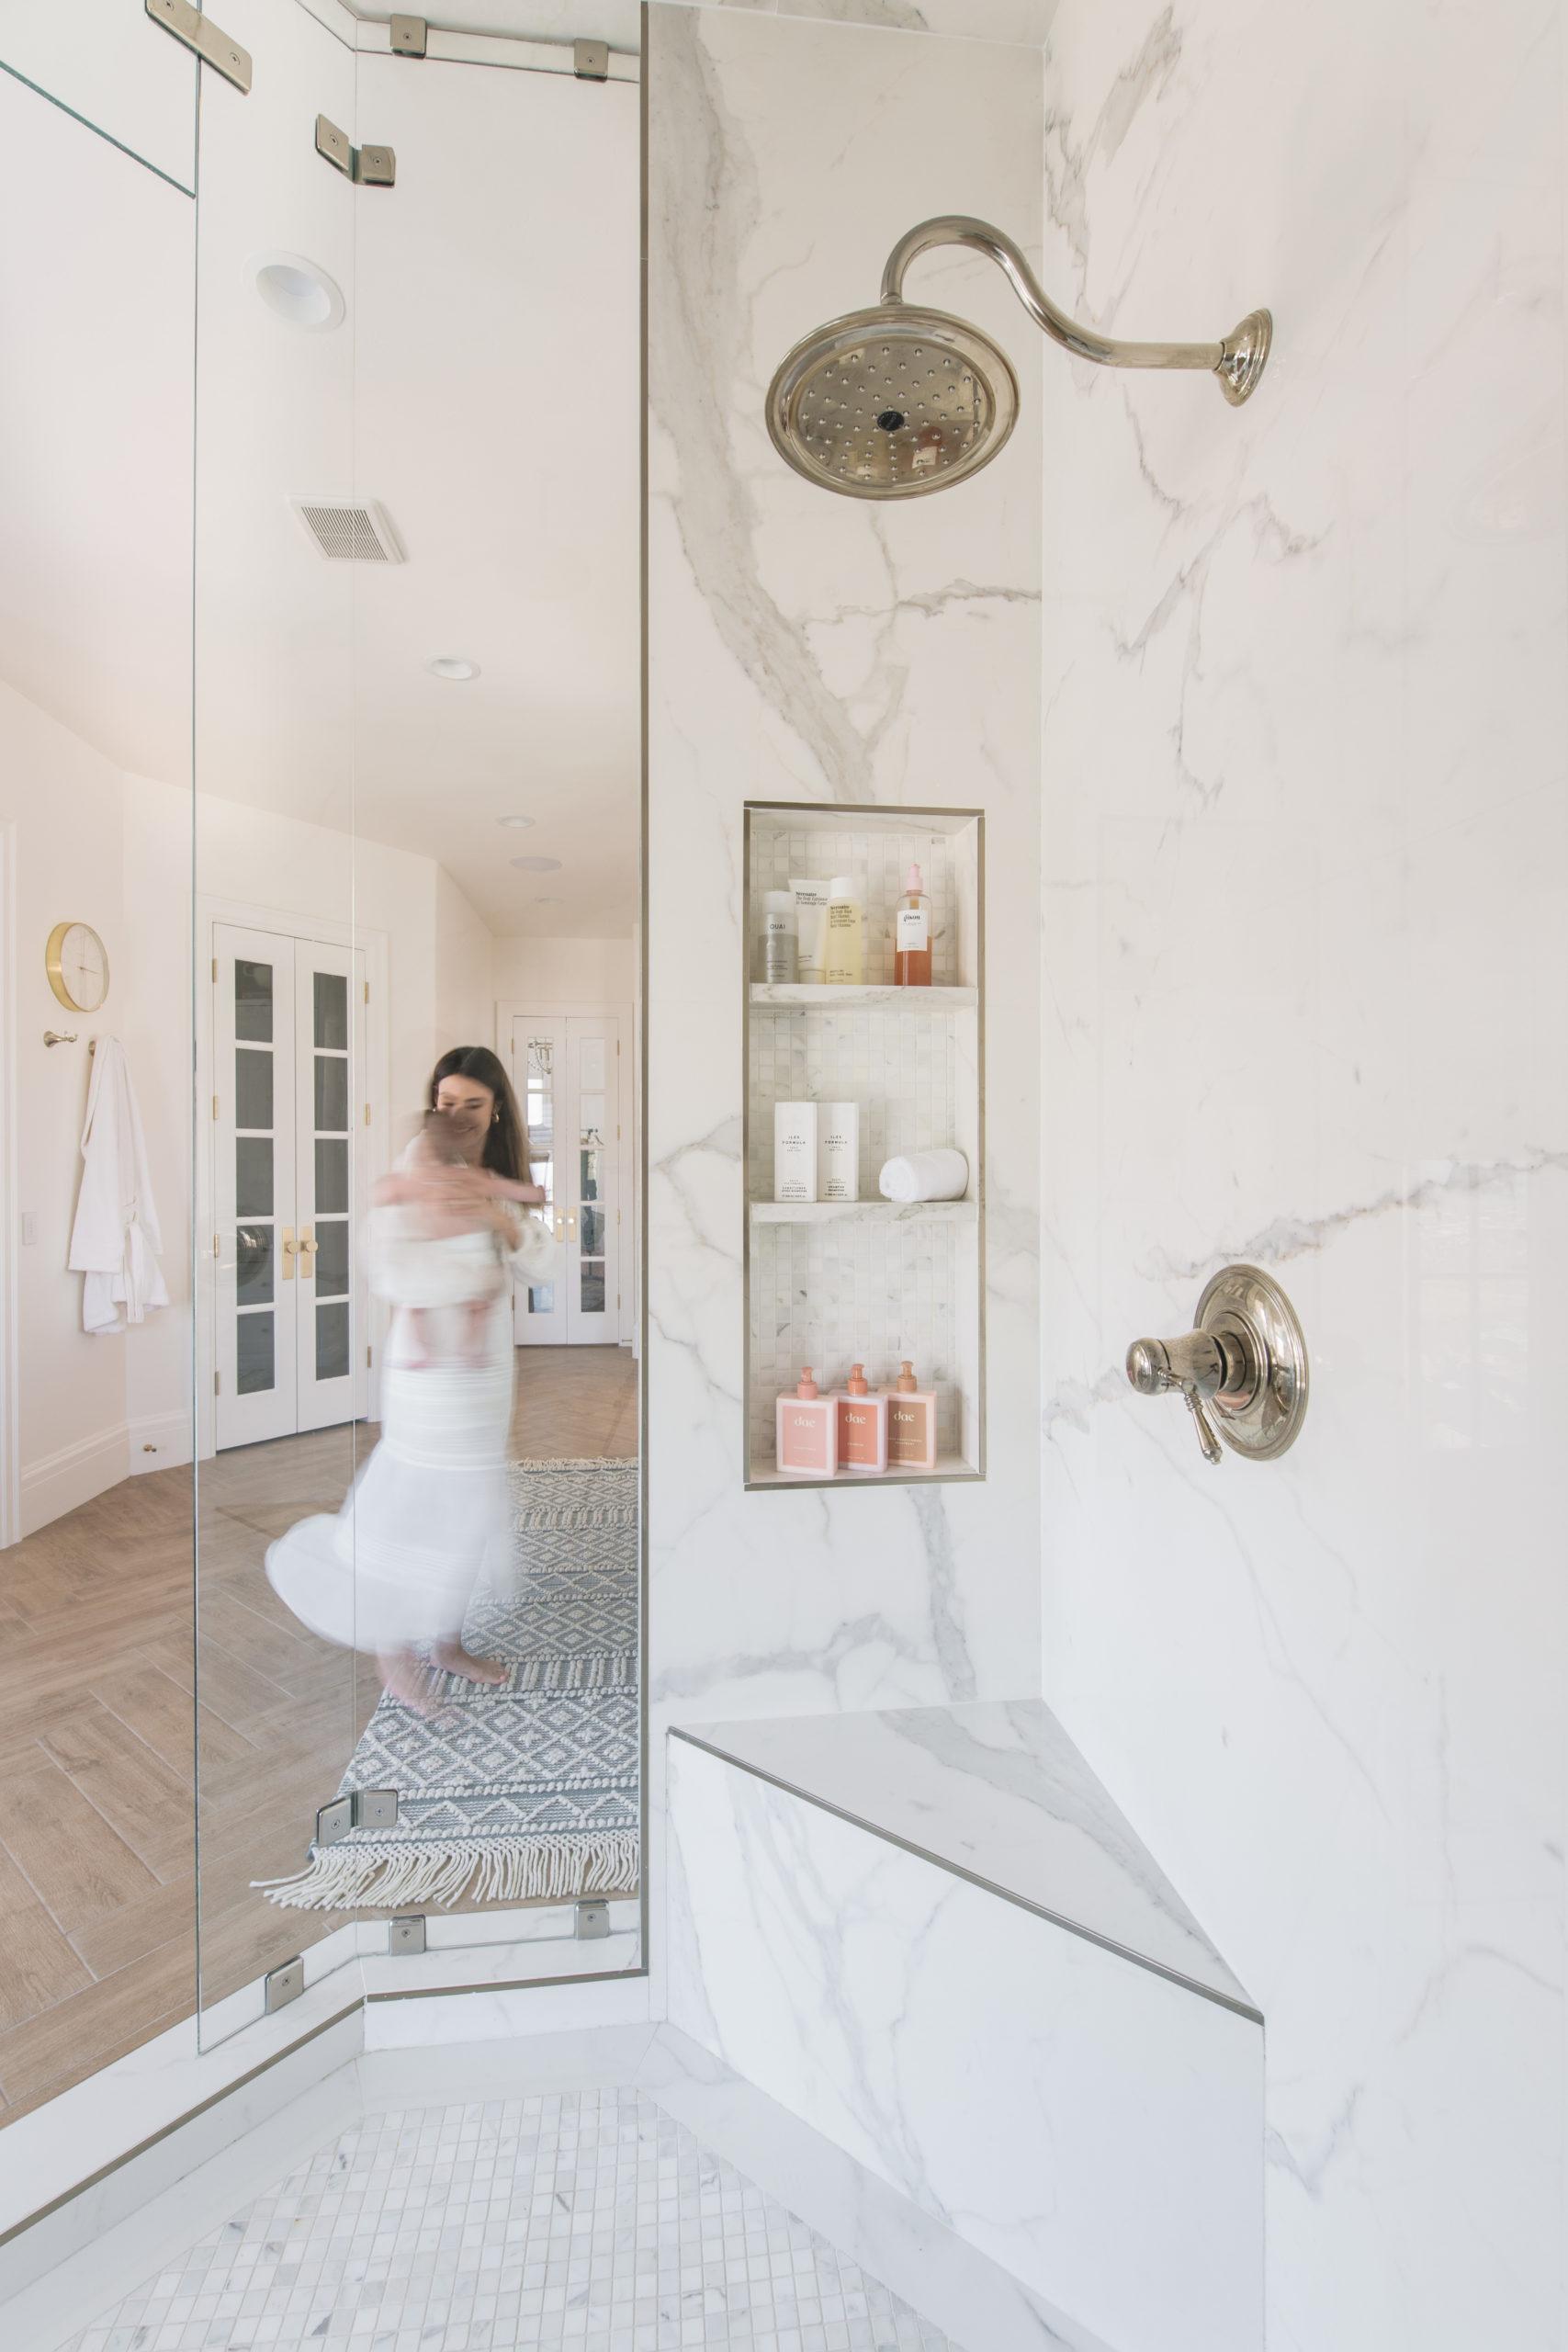 dae hair luxe shower